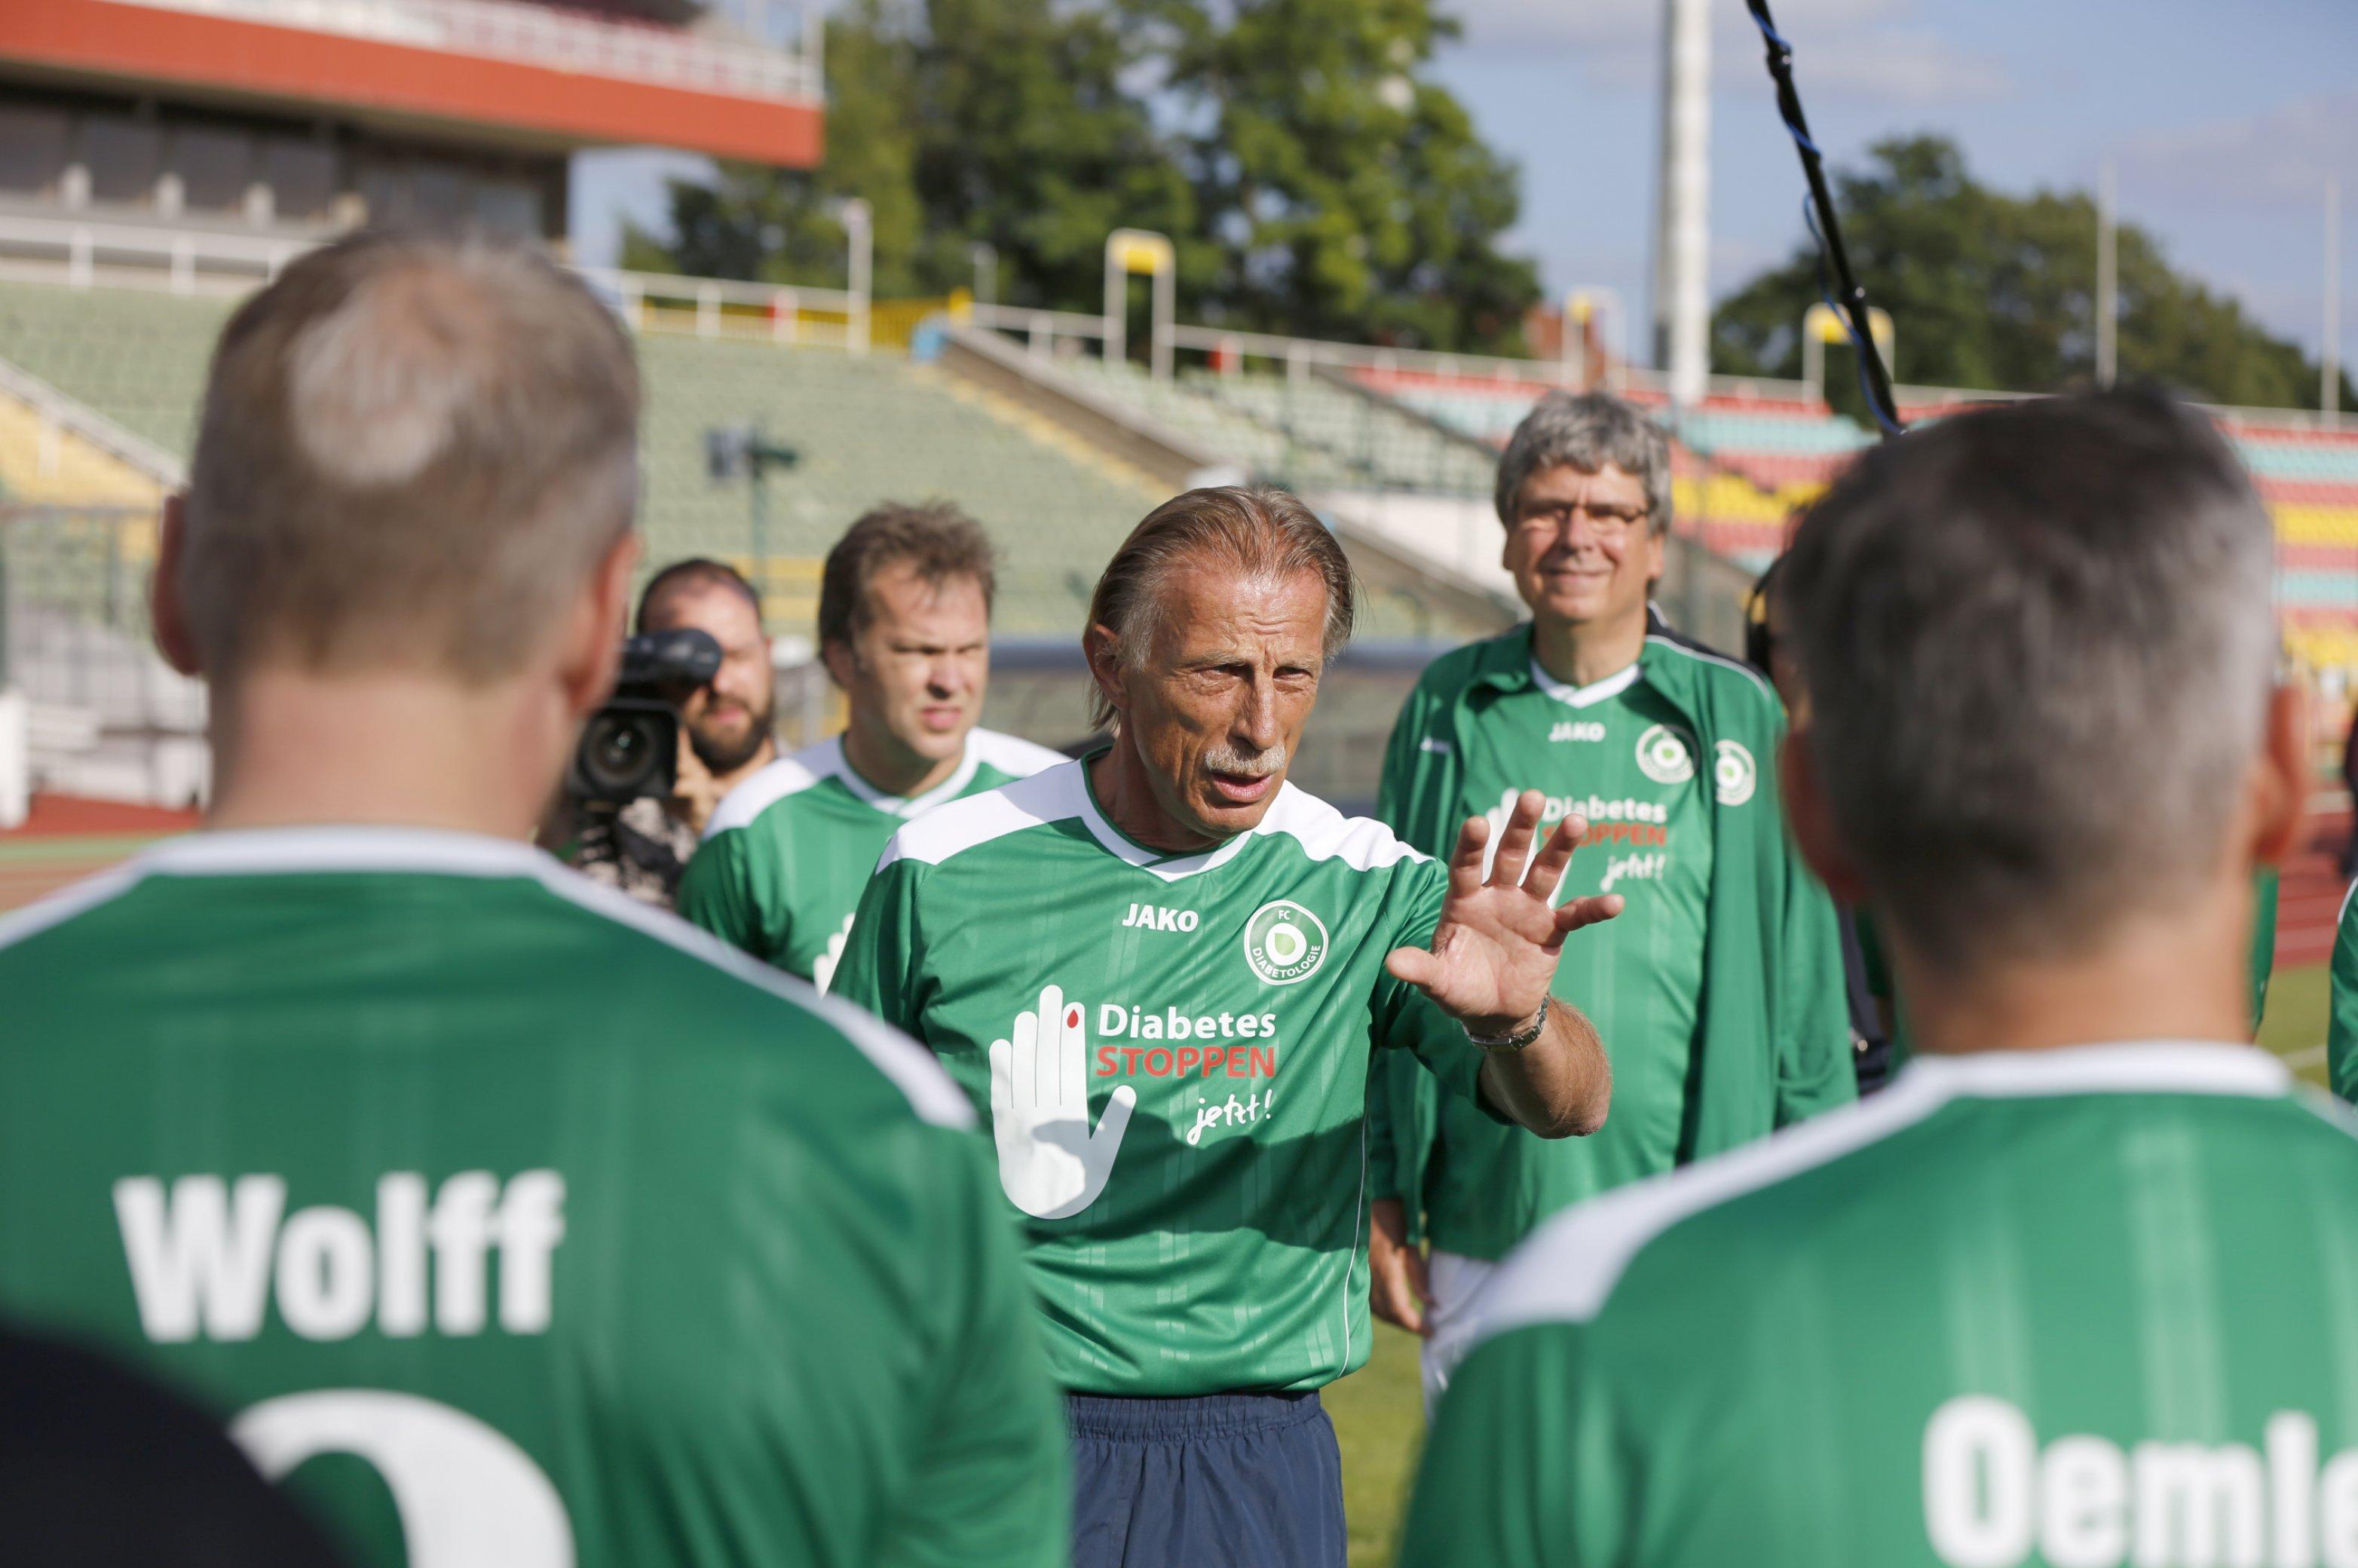 FC Diabetologie vs. FC Bundestag 12. Juni 2018: Mannschaftsbriefing durch Christoph Daum